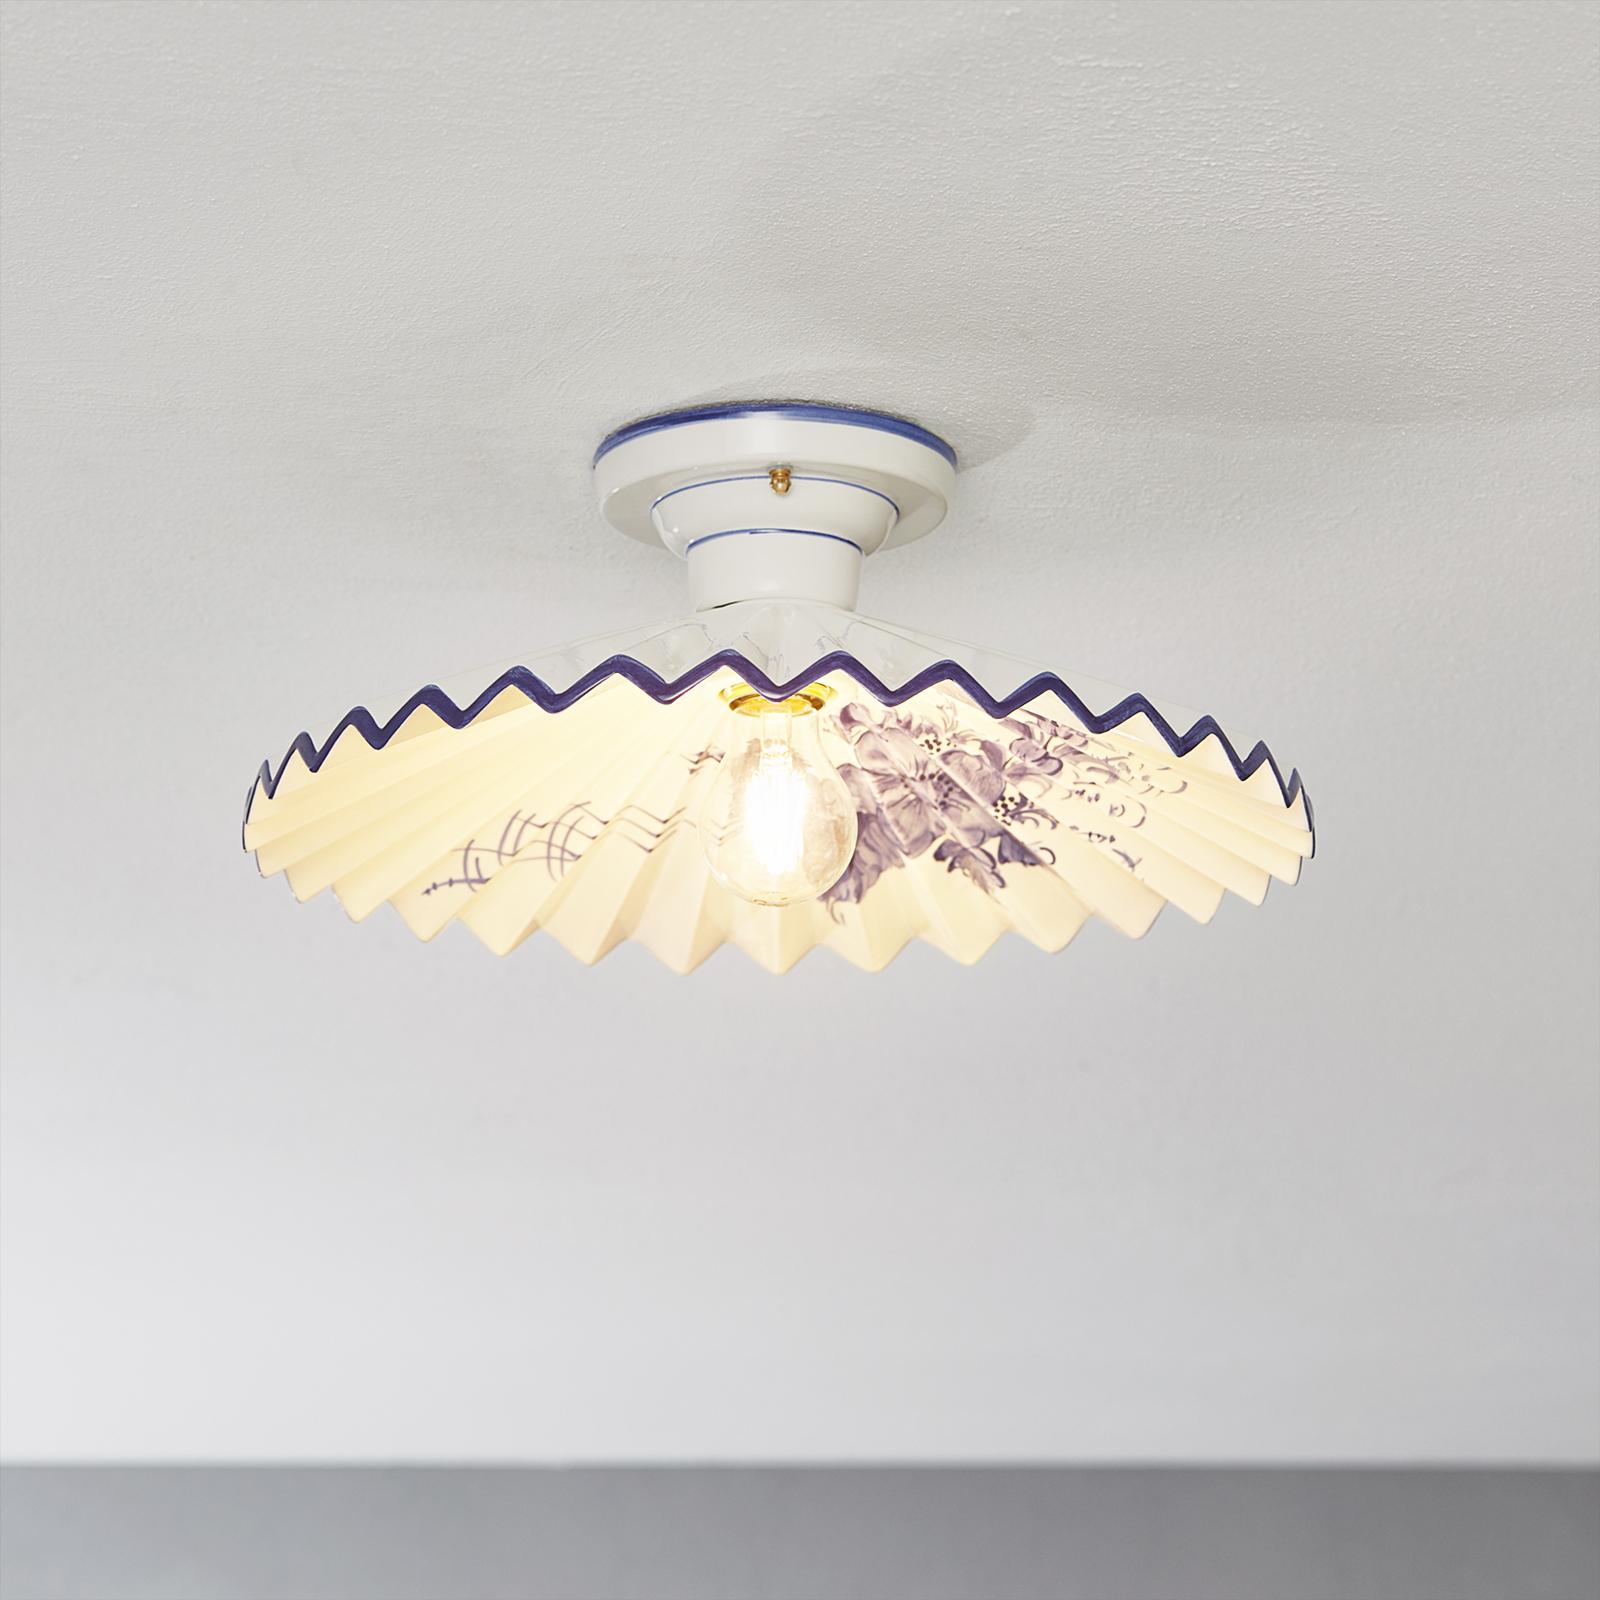 Lampa sufitowa AUGUSTUS z odstępem